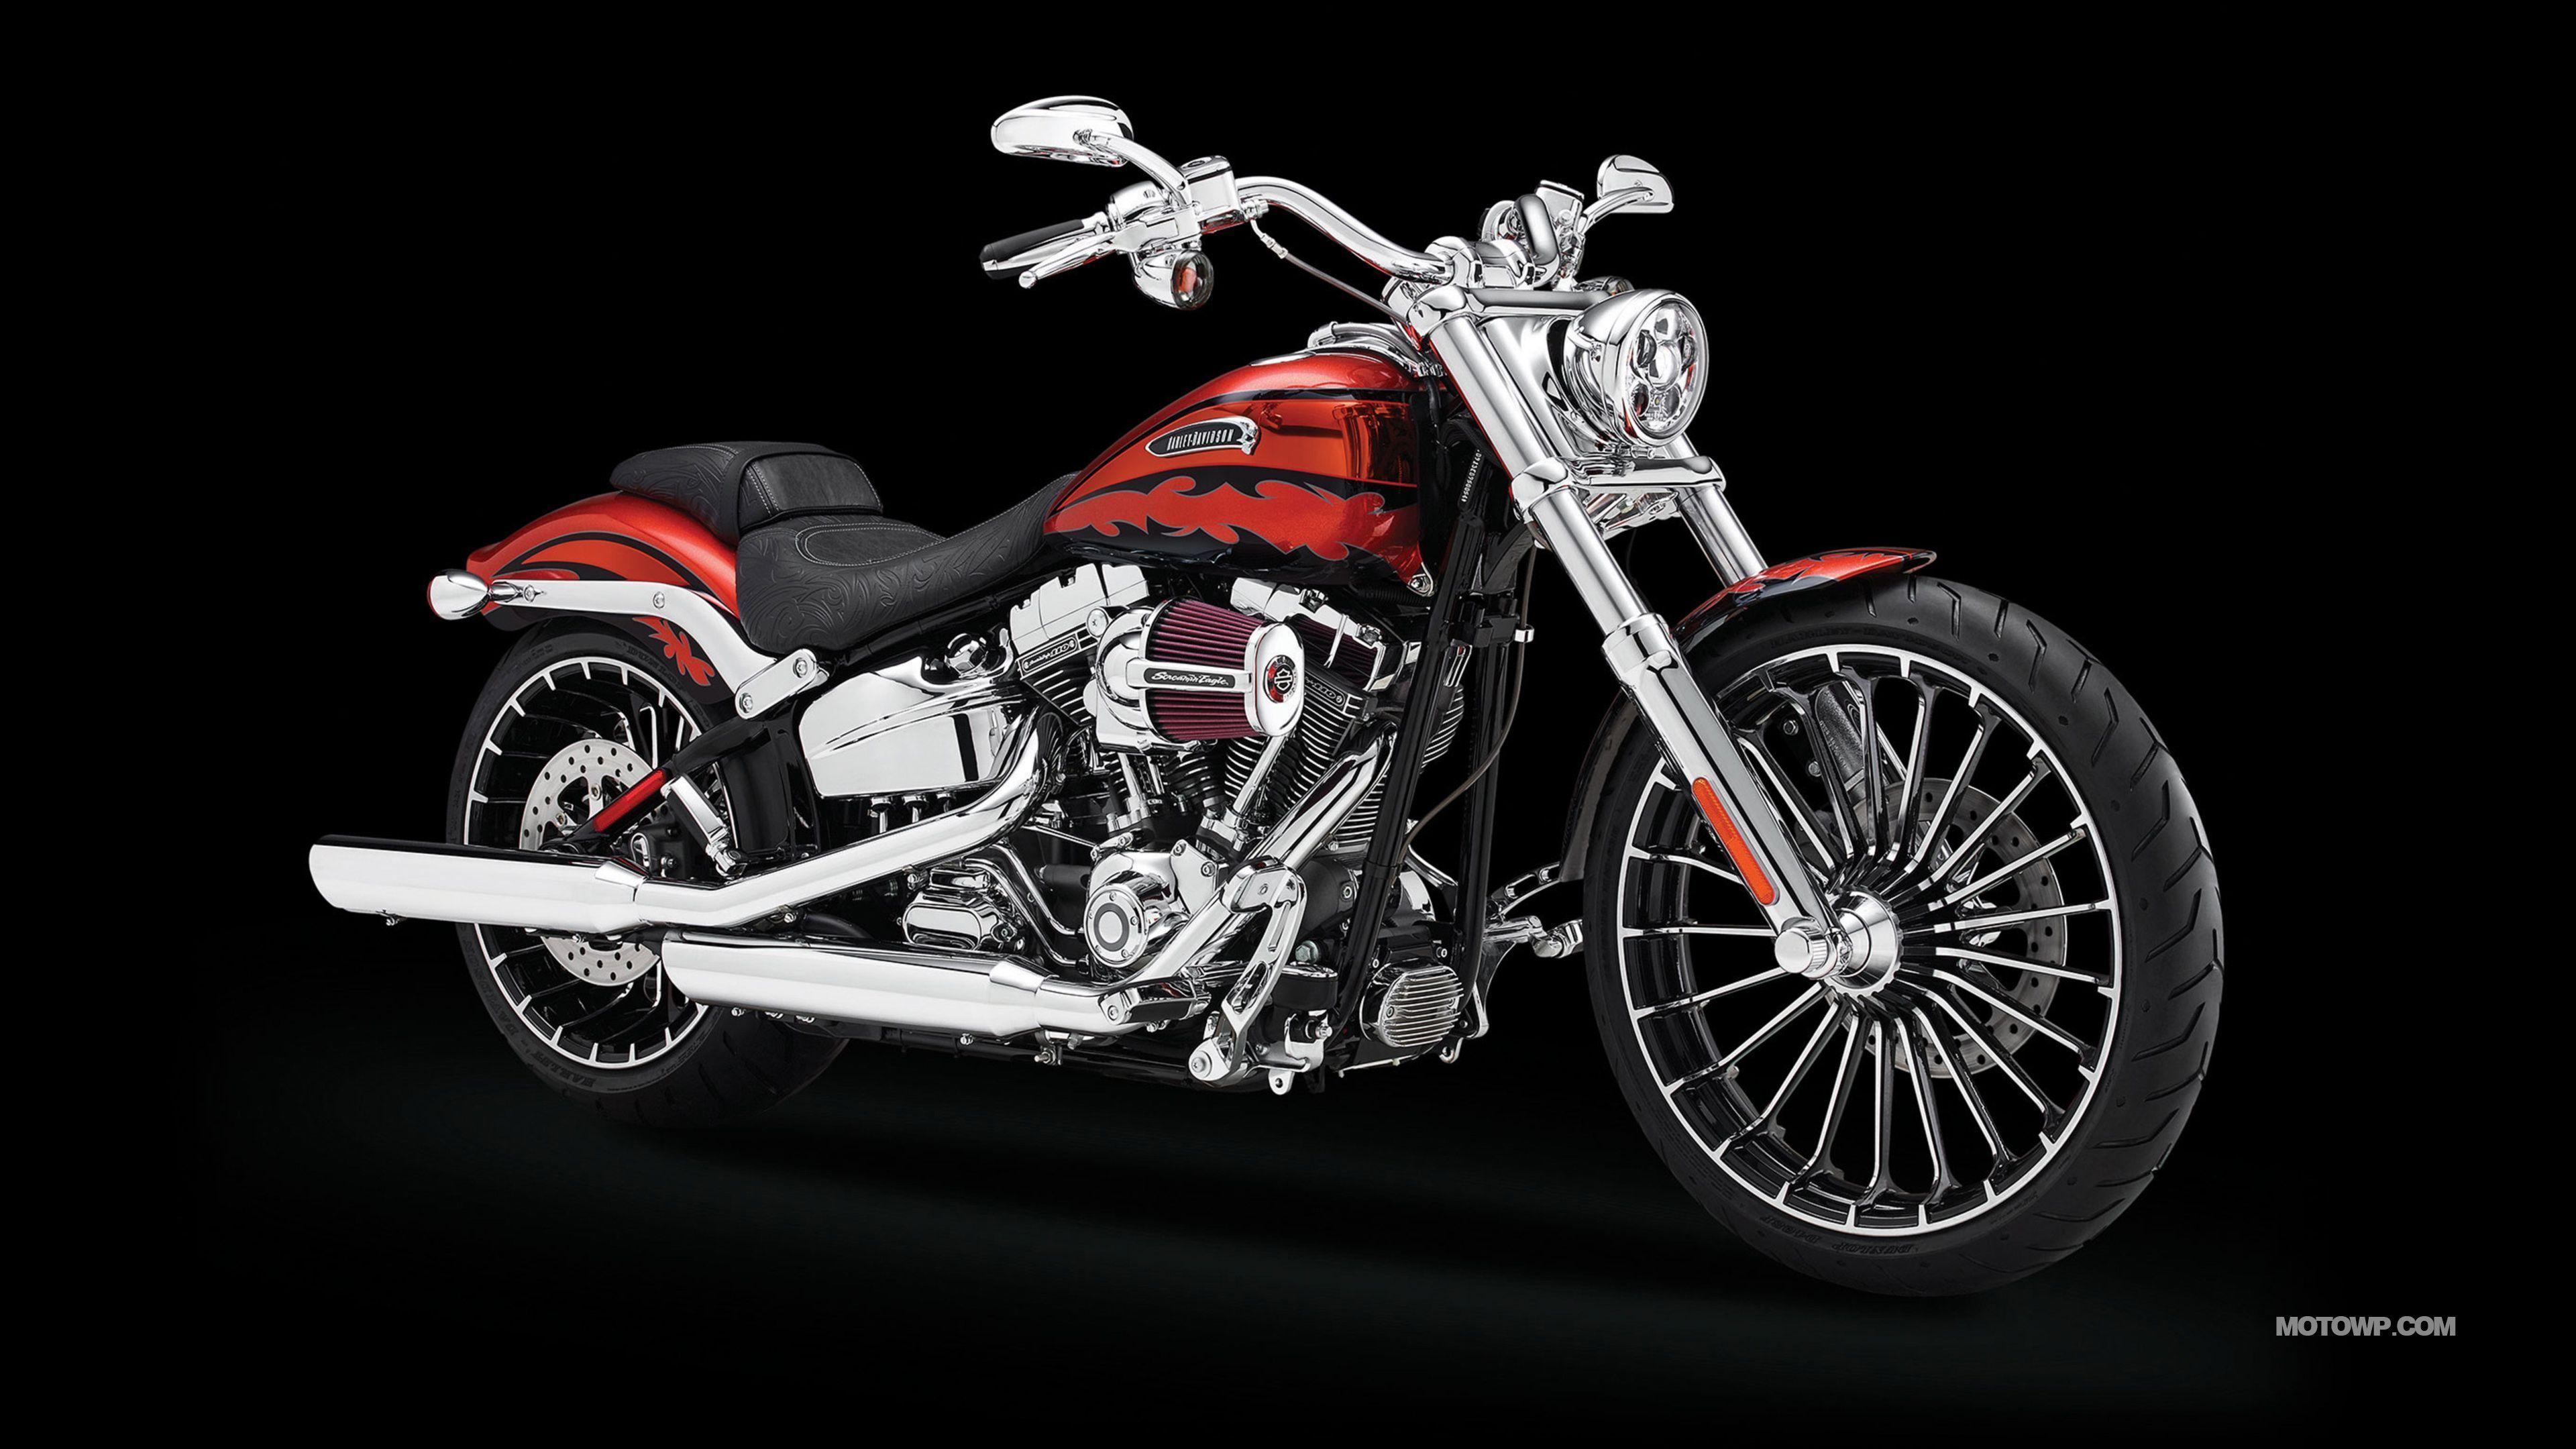 34 best free easy rider motorcycle desktop wallpapers - wallpaperaccess